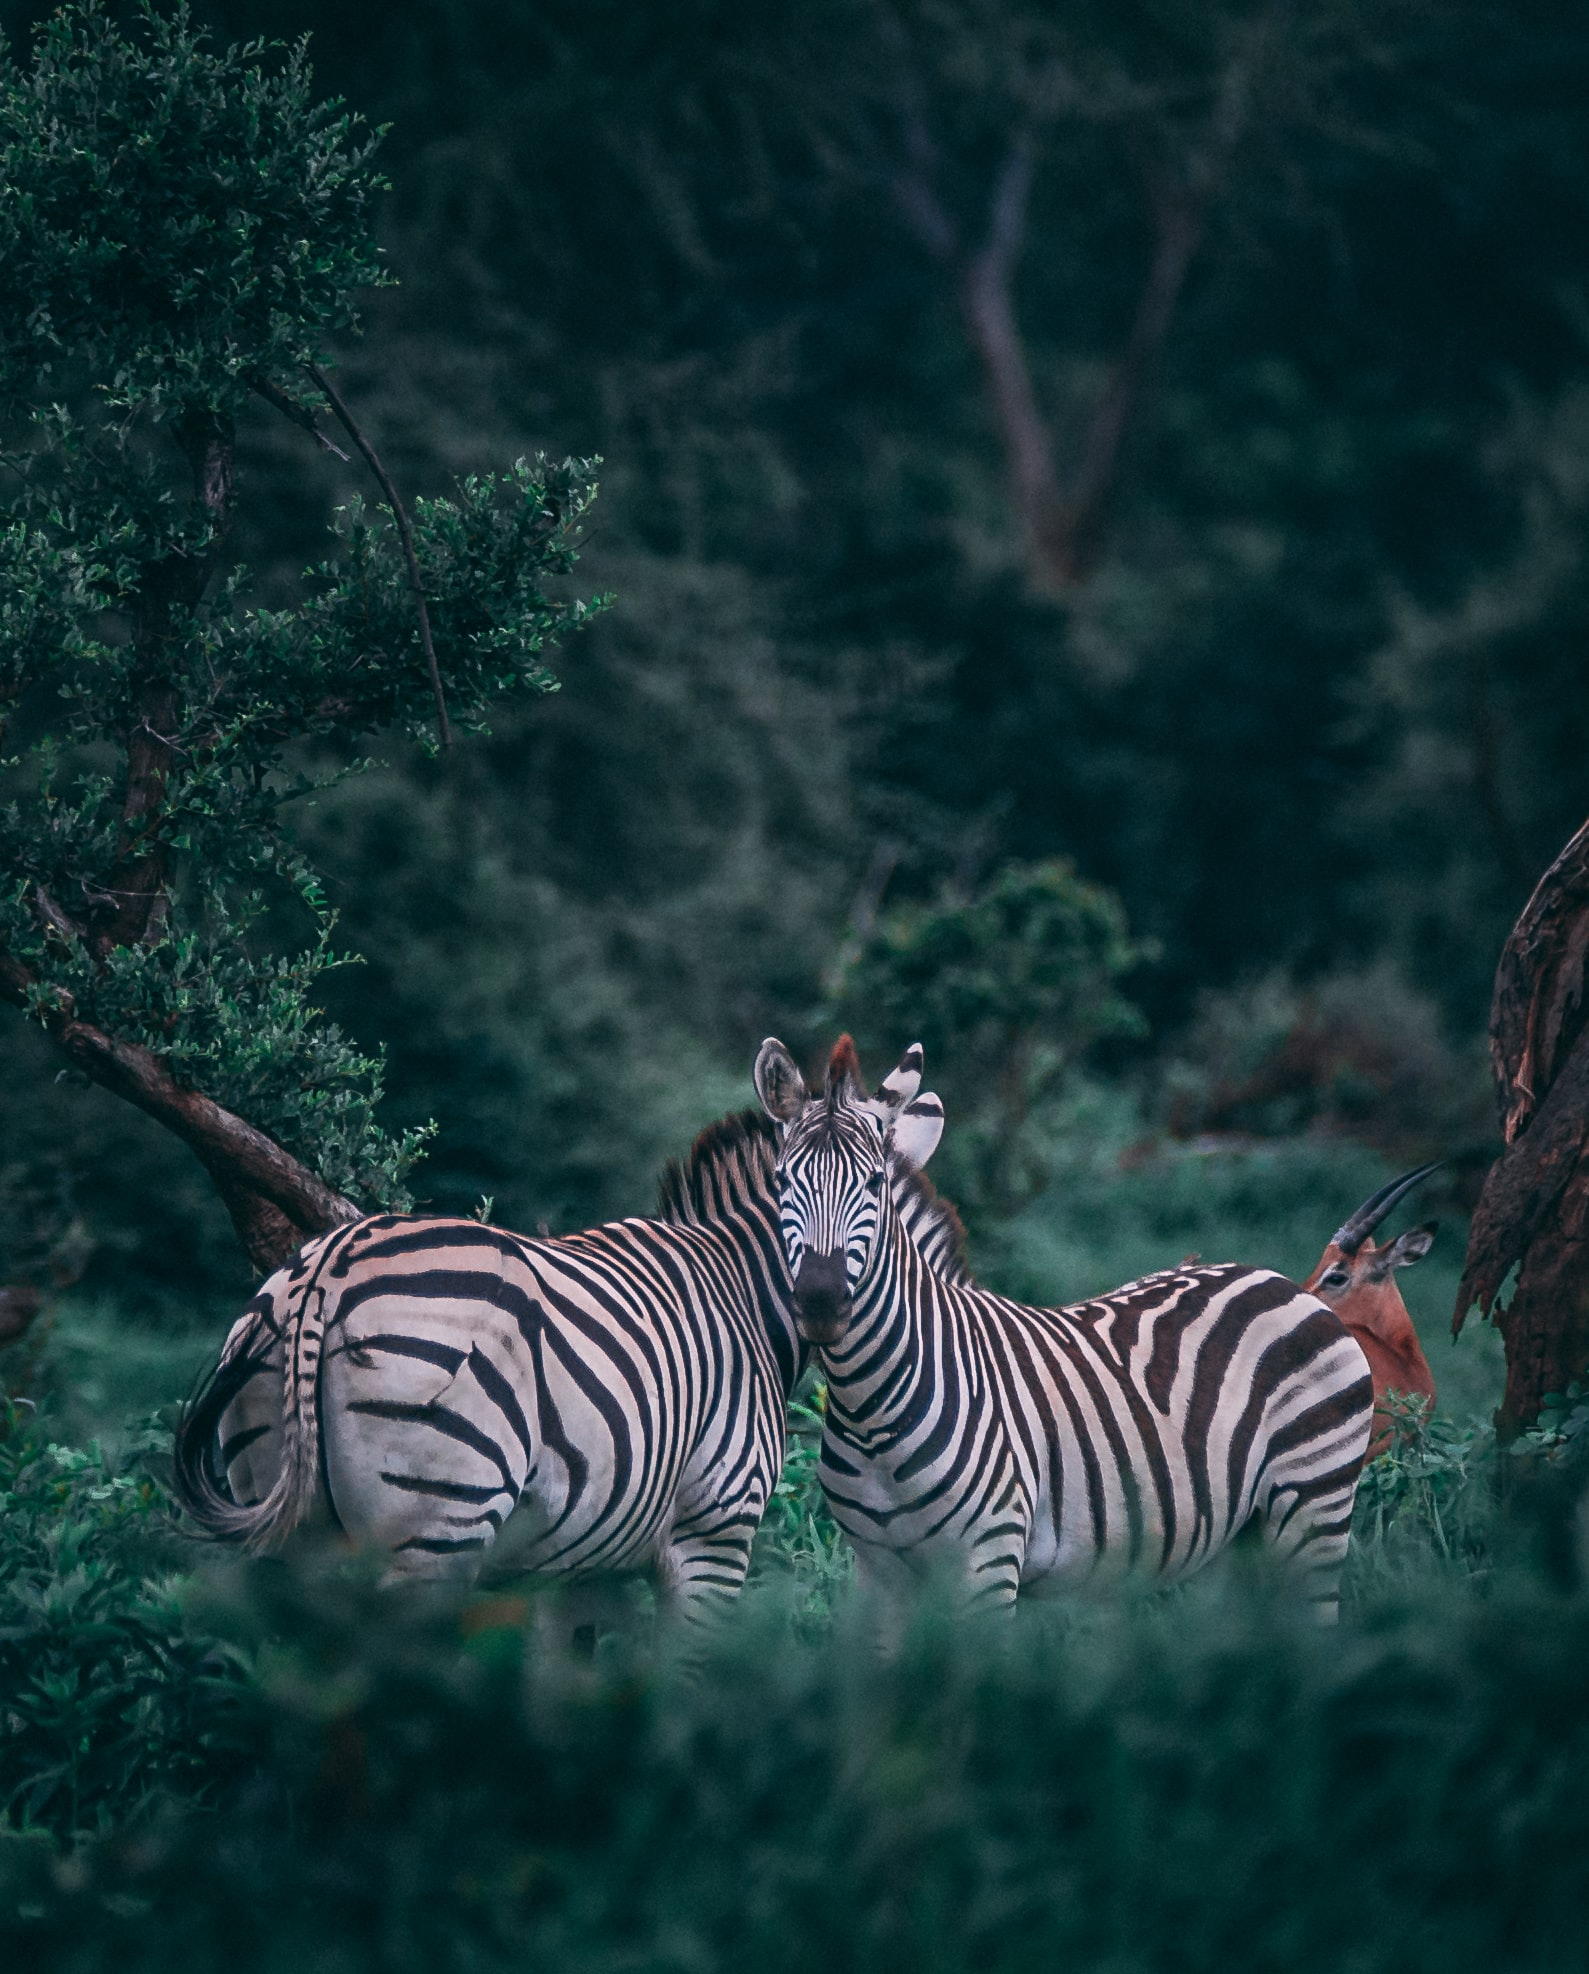 Two zebras in bushes.